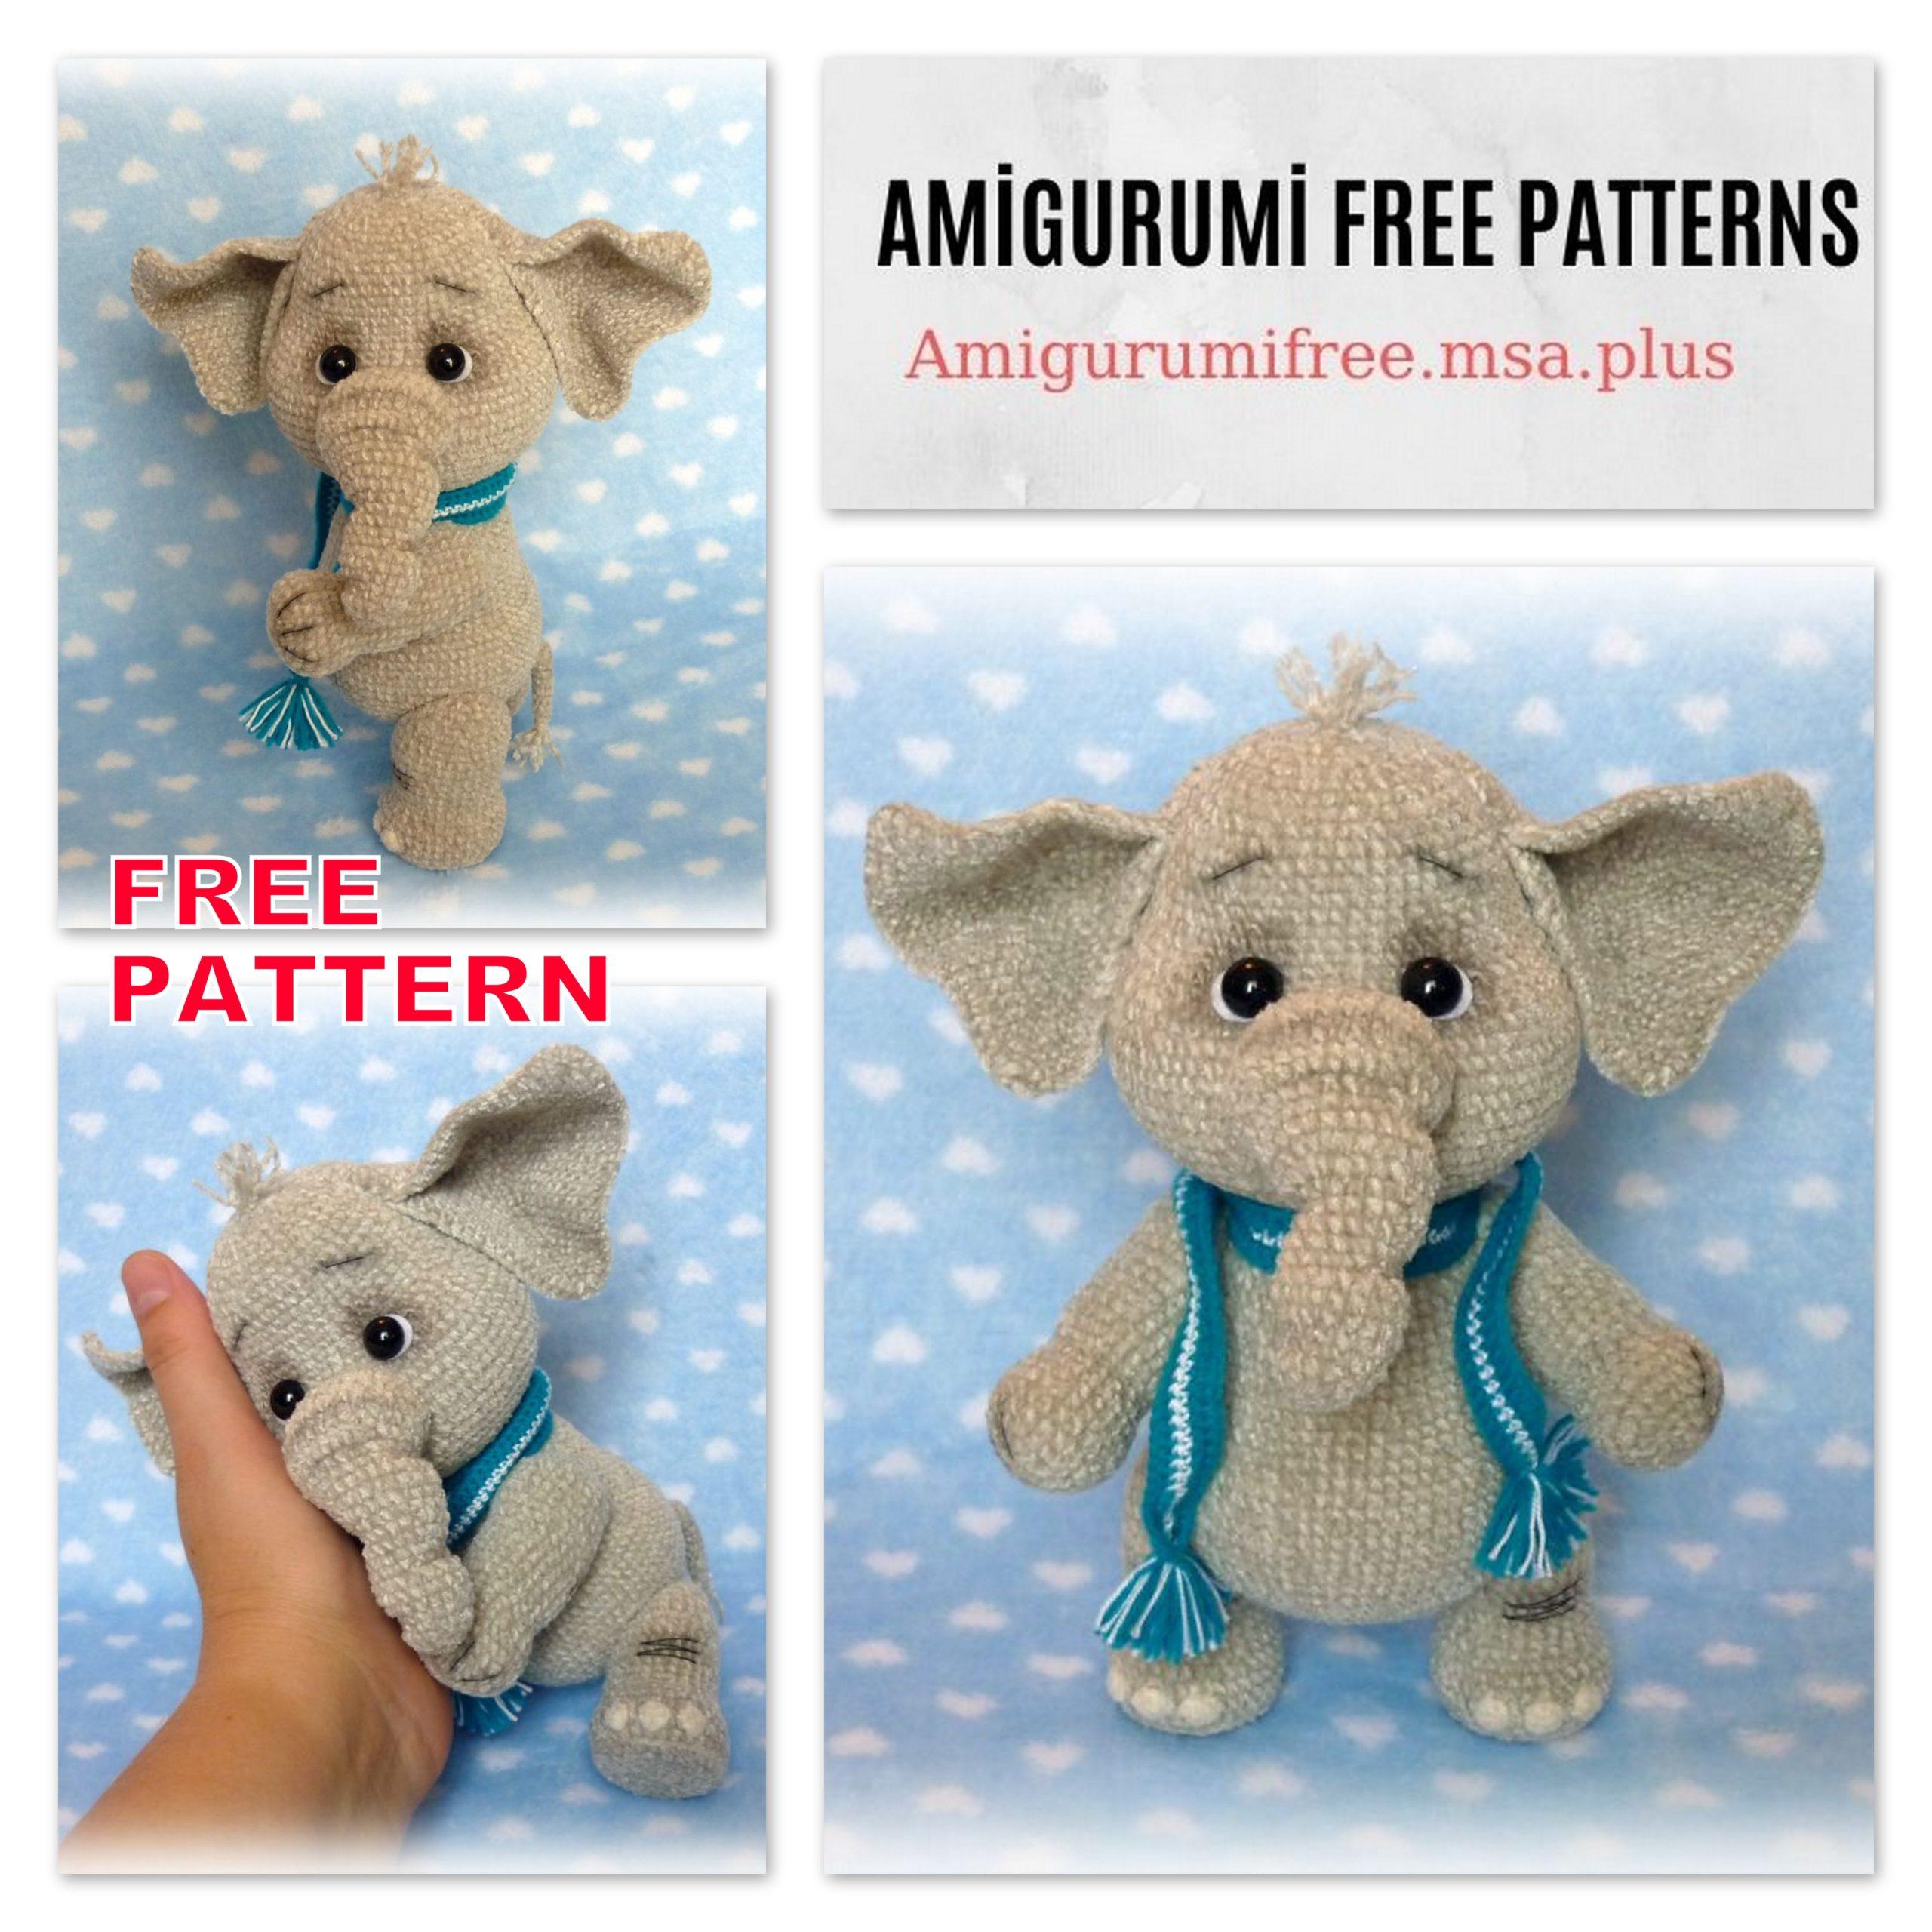 Amiguroom Toys   Free amigurumi patterns   2560x2560